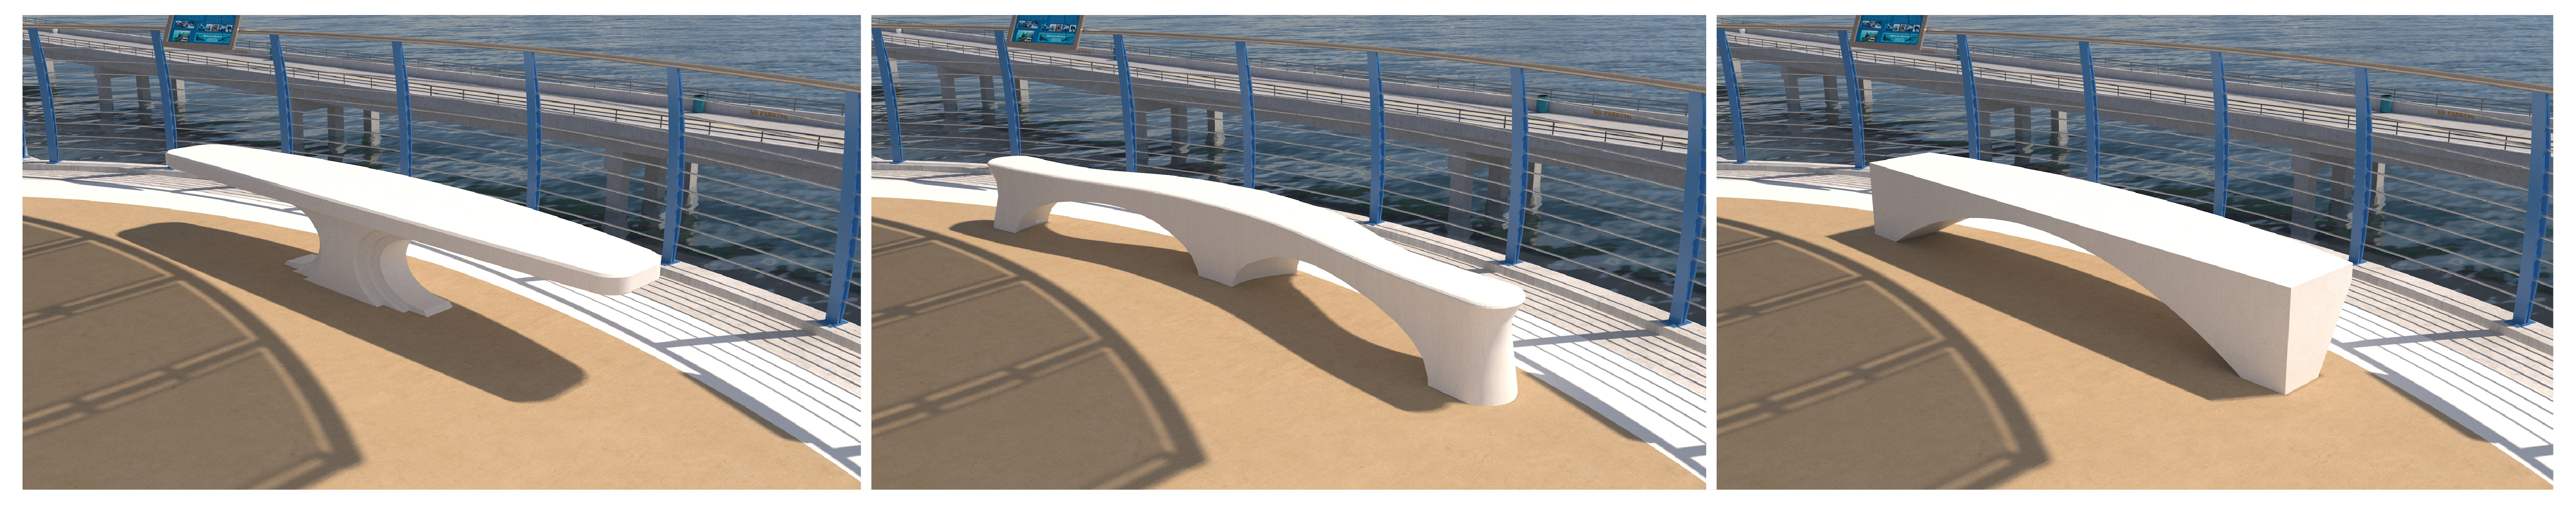 Escambia, Santa Rosa High School Students to Vote on Pensacola Bay Bridge Mile Markers, Benches